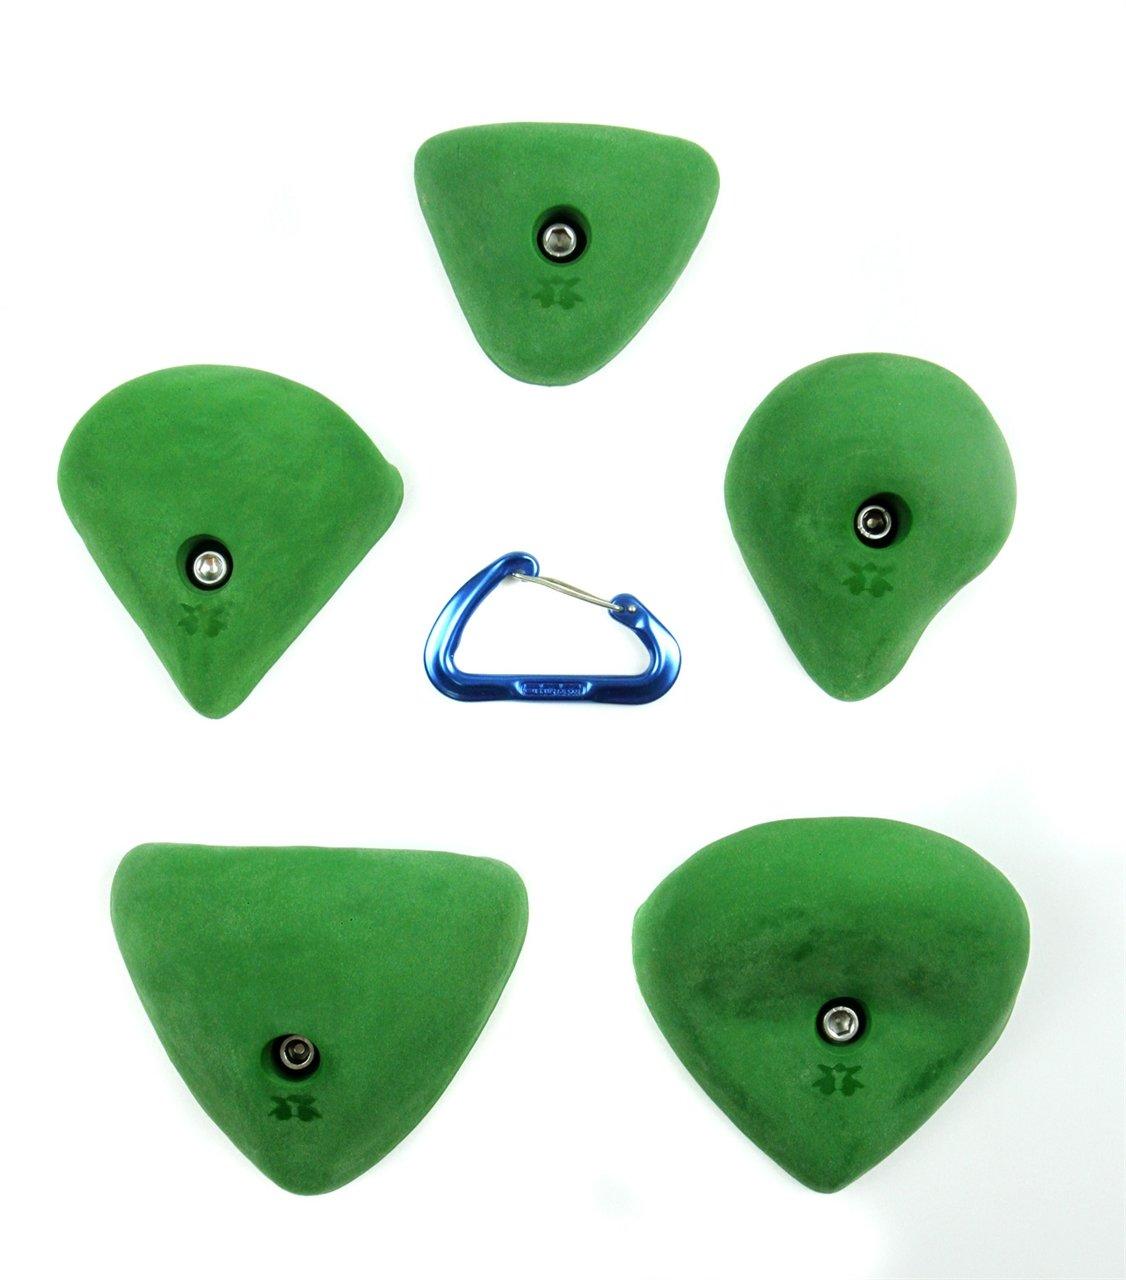 5 XL Yaniro Jugs by Atomik | Climbing Holds | Green